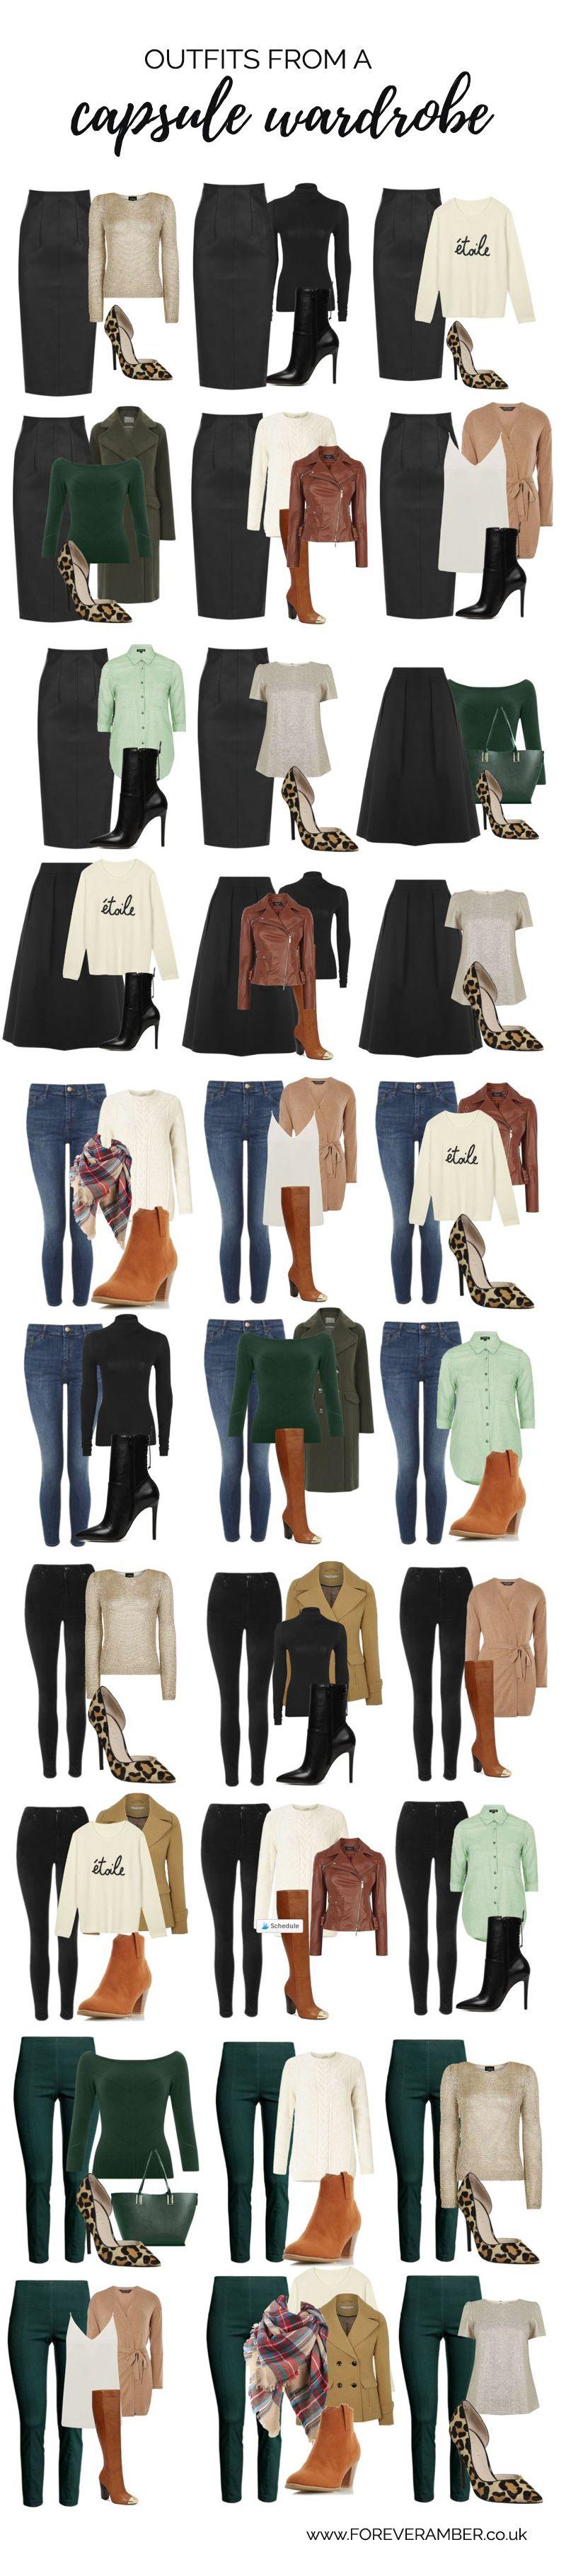 Capsule wardrobe for autumn winter wardrobe essentials